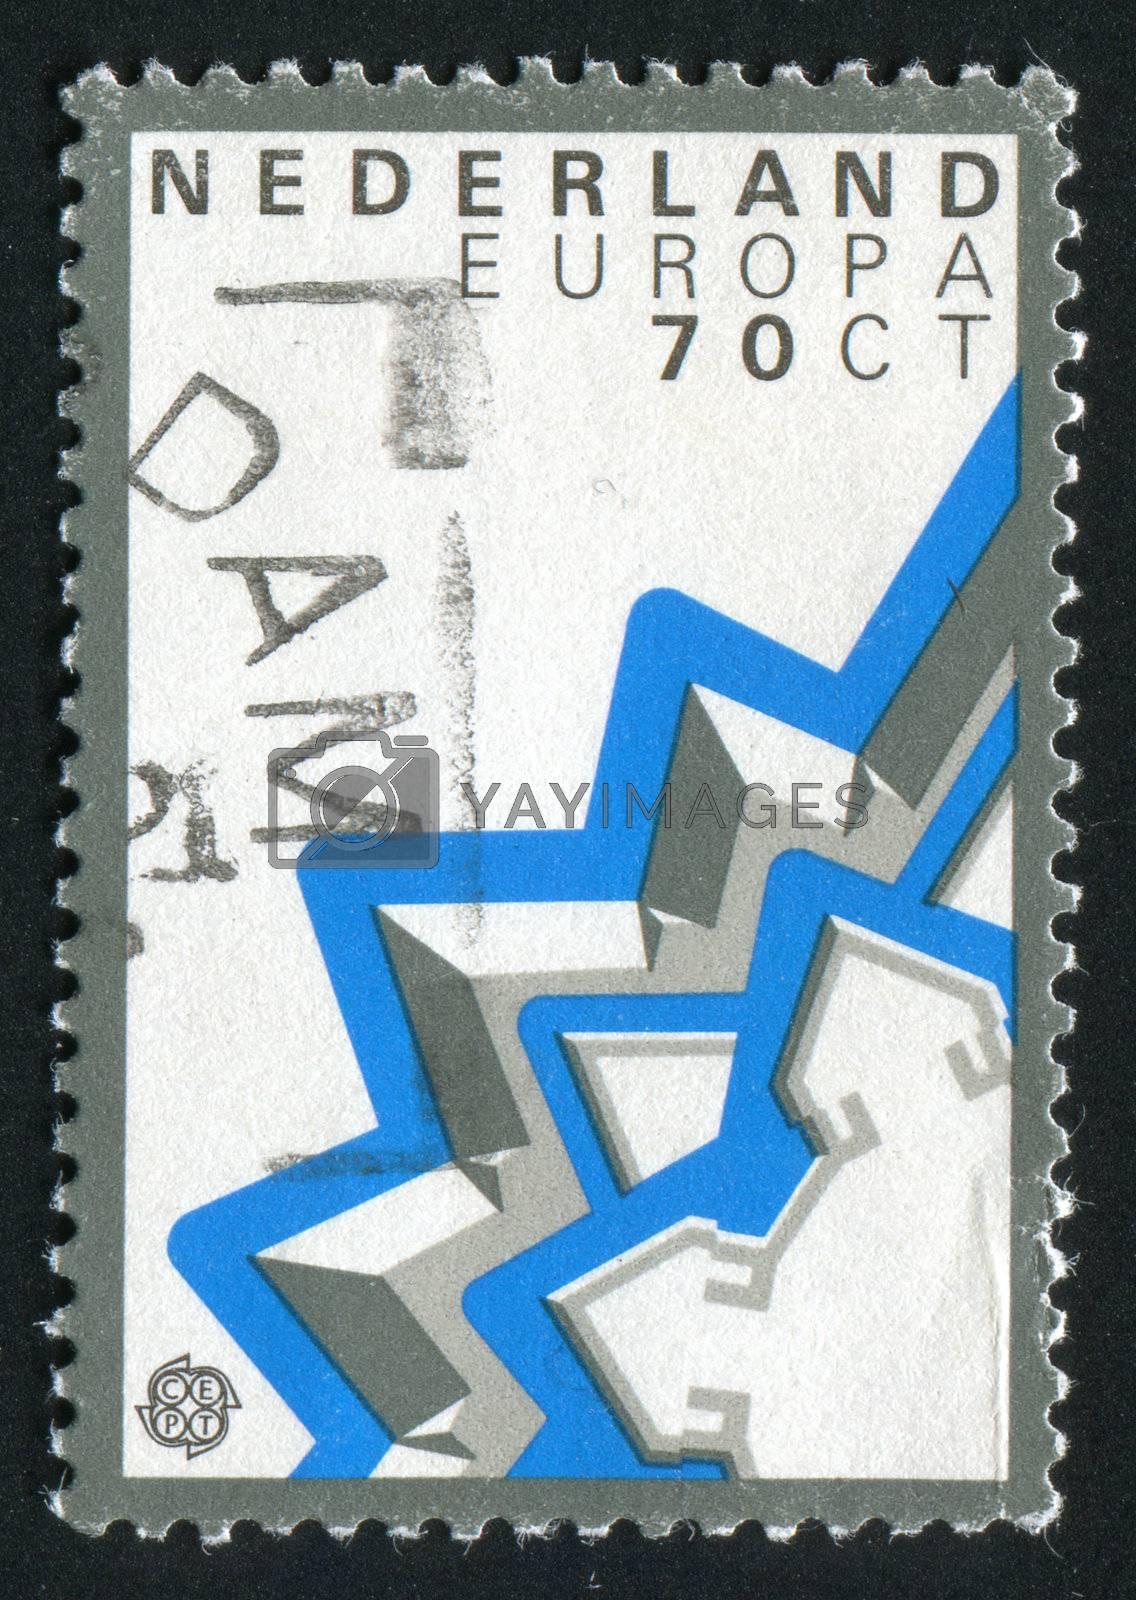 NETHERLANDS - CIRCA 1972: Sparkling stars on a white background, circa 1972.